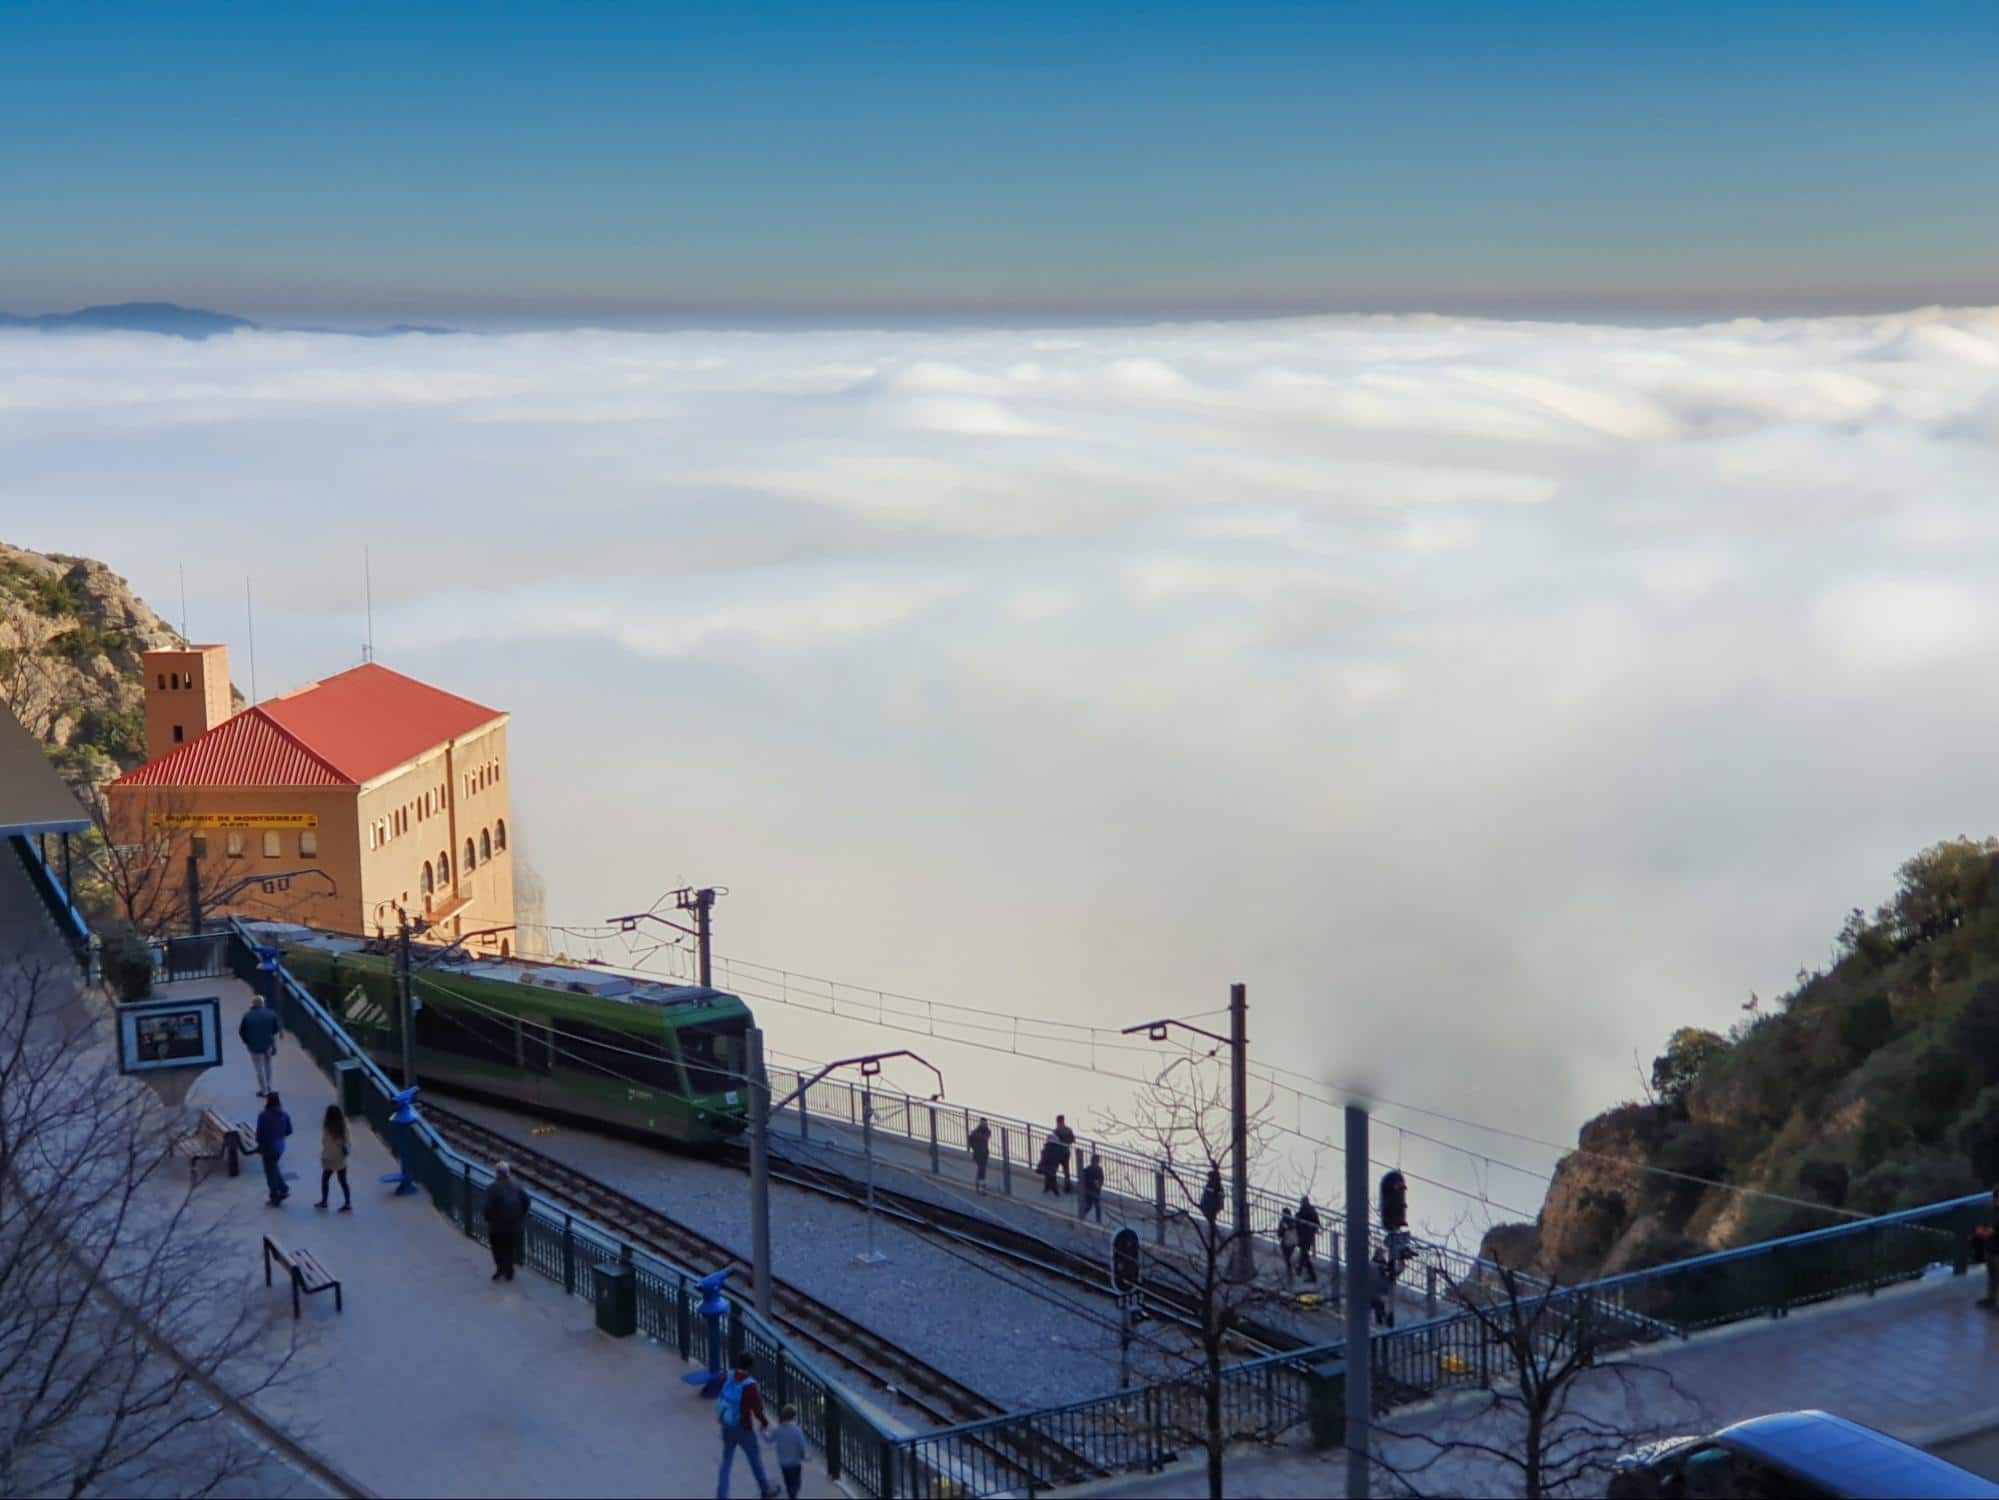 Cremallera train arriving in Montserrat